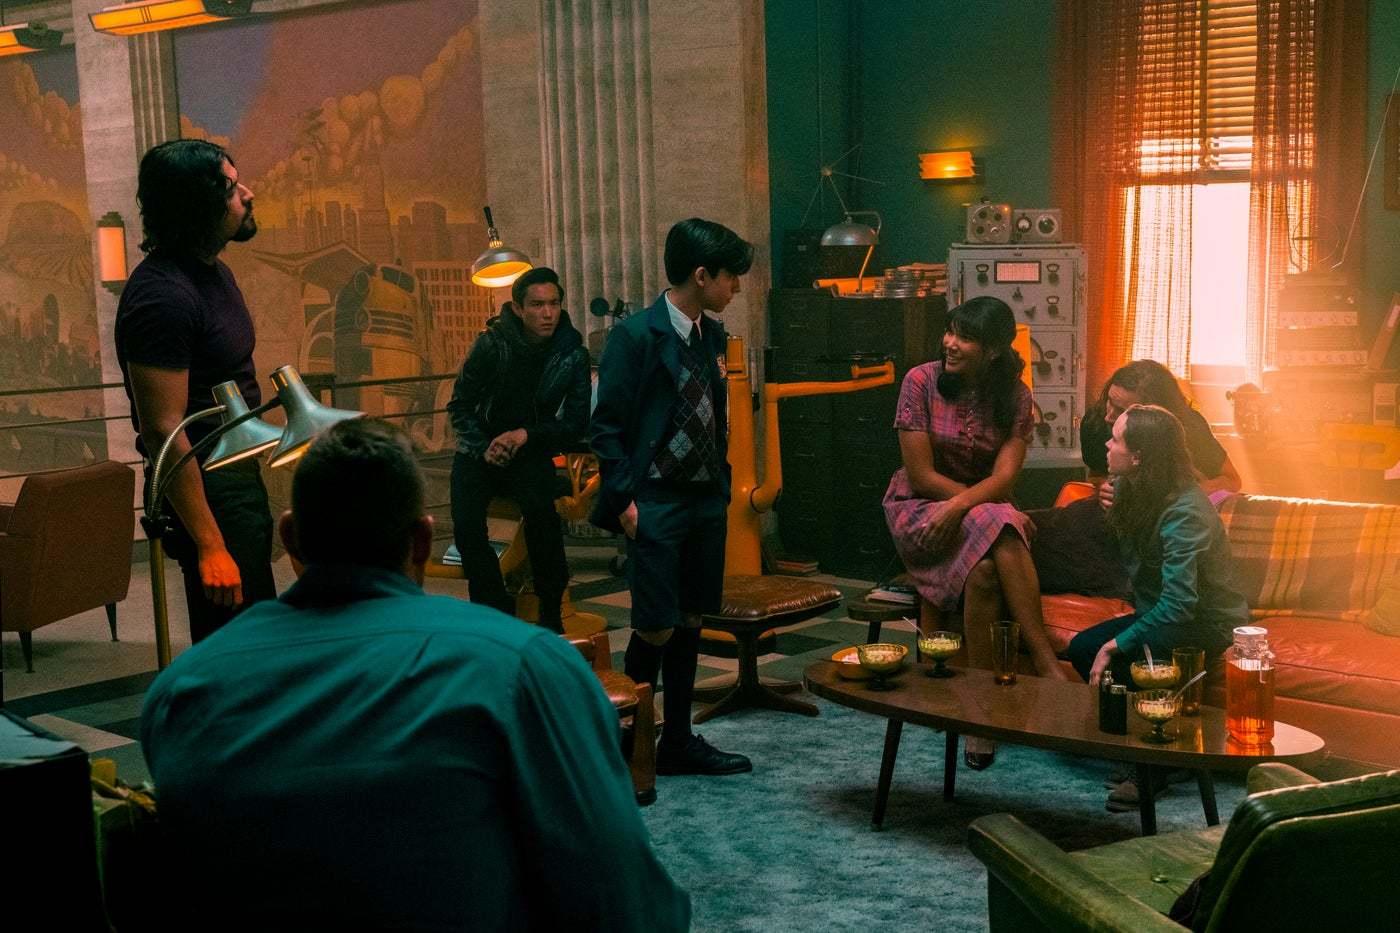 Netflix在《伞学院》第2季首映中透漏了相关剧情顺序